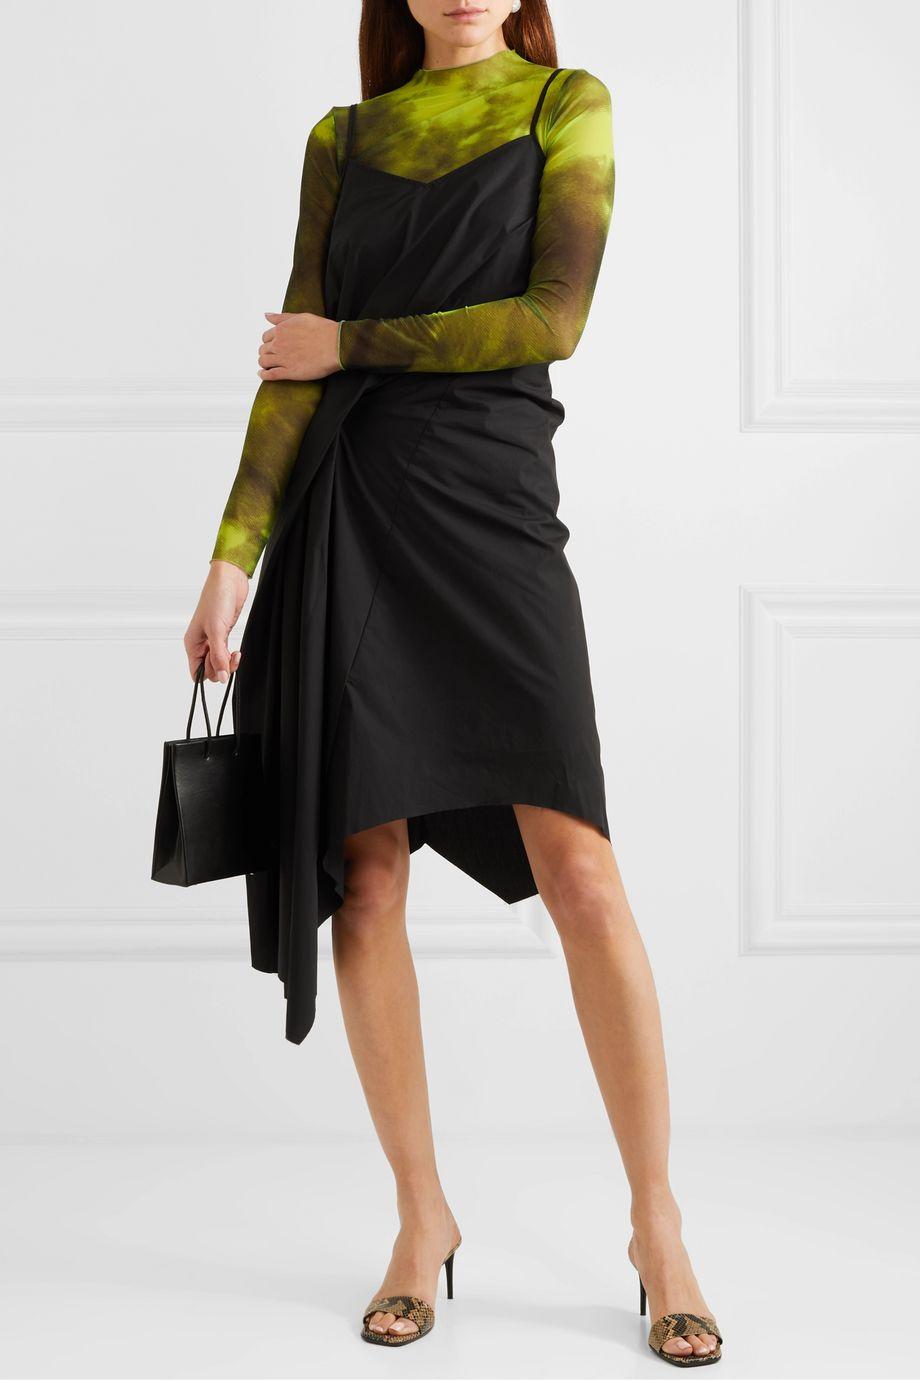 Black Asymmetric Draped Cotton Poplin Dress Marques Almeida Net A Porter Poplin Dress Cotton Poplin Dresses [ 1380 x 920 Pixel ]